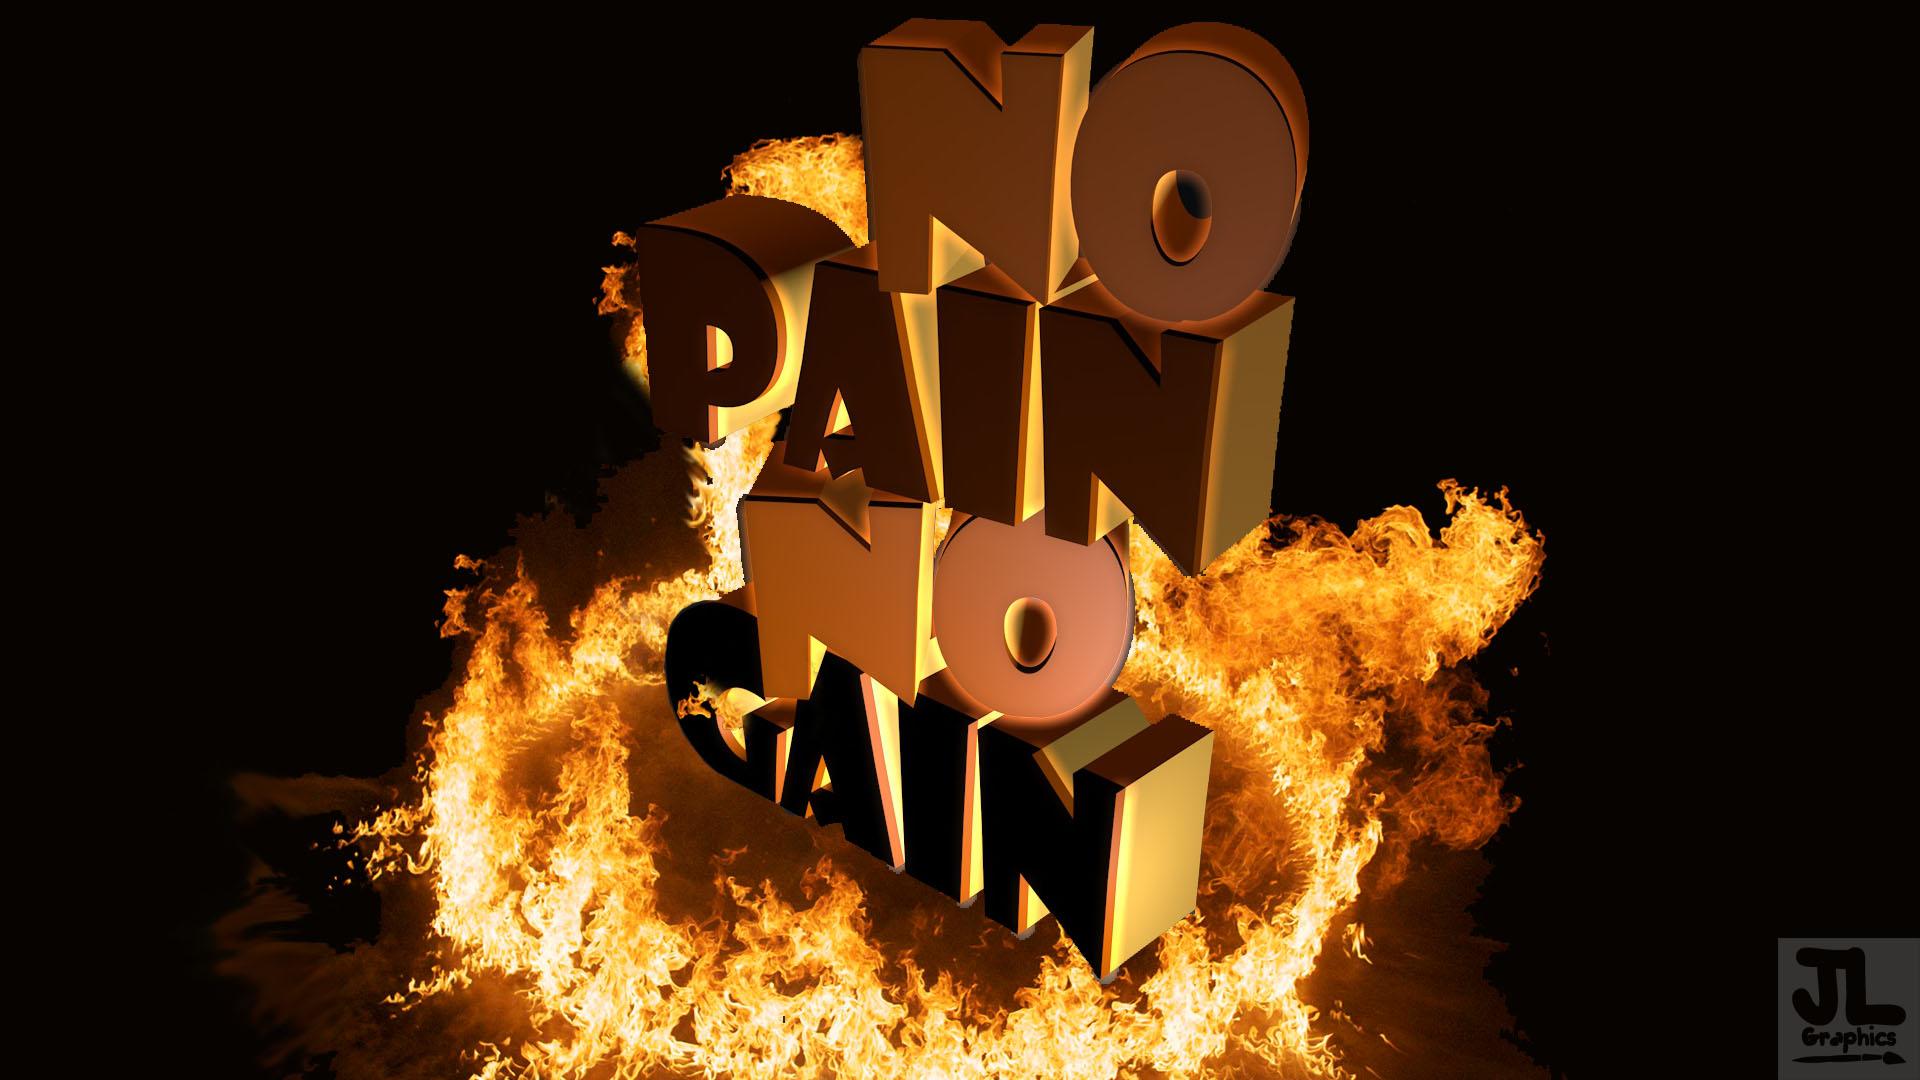 No Pain No Gain Wallpaper By Kubula333 On Deviantart